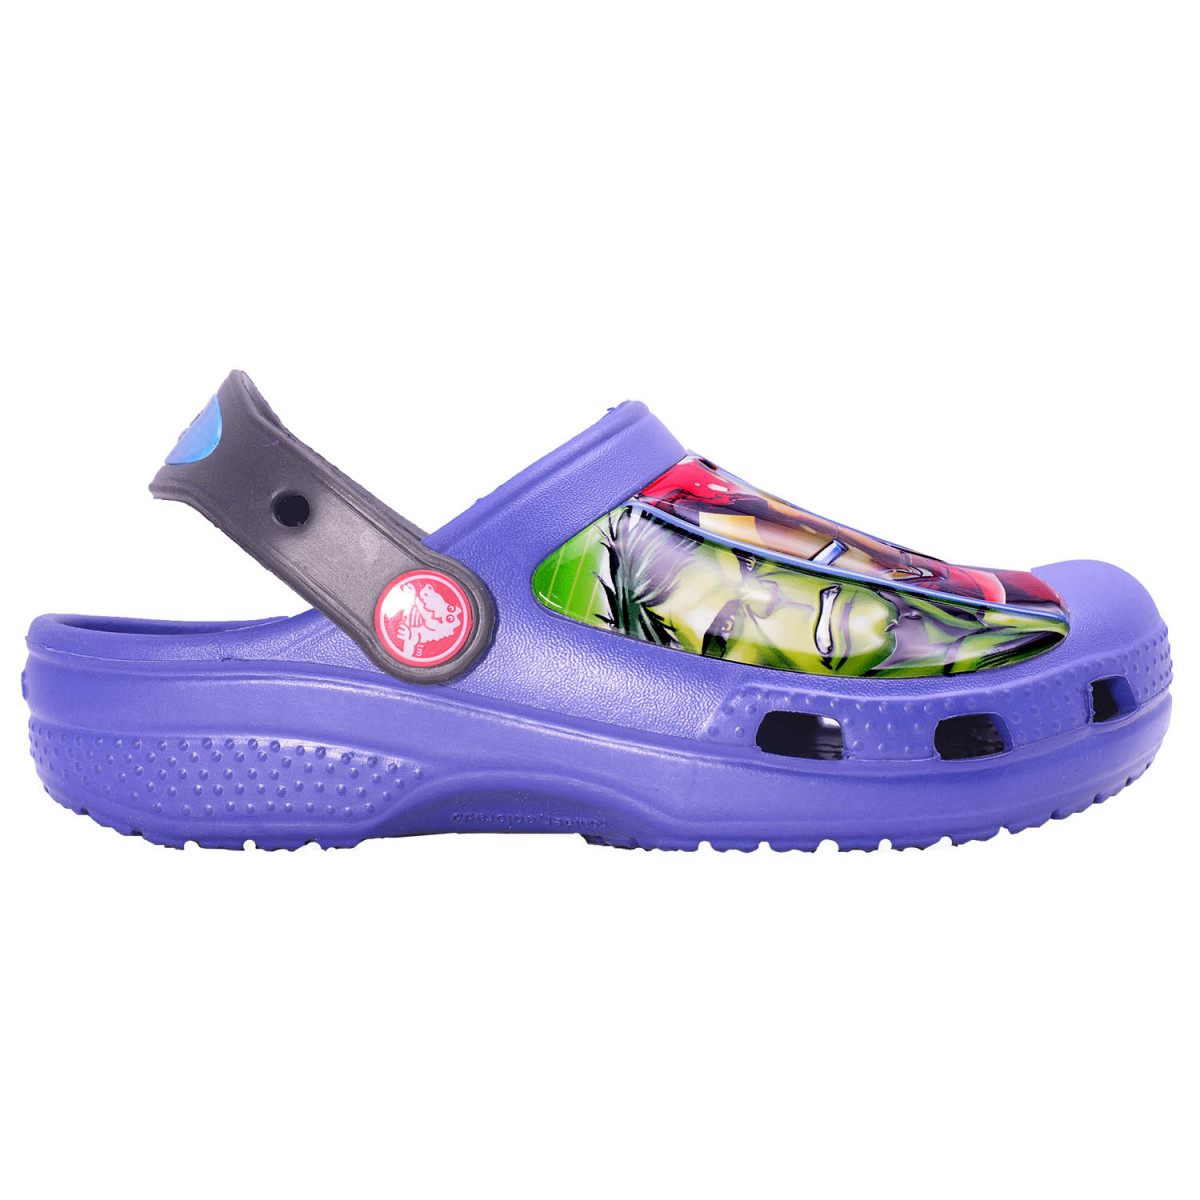 Zuecos Crocs Crocband Avengers Assemble Kids